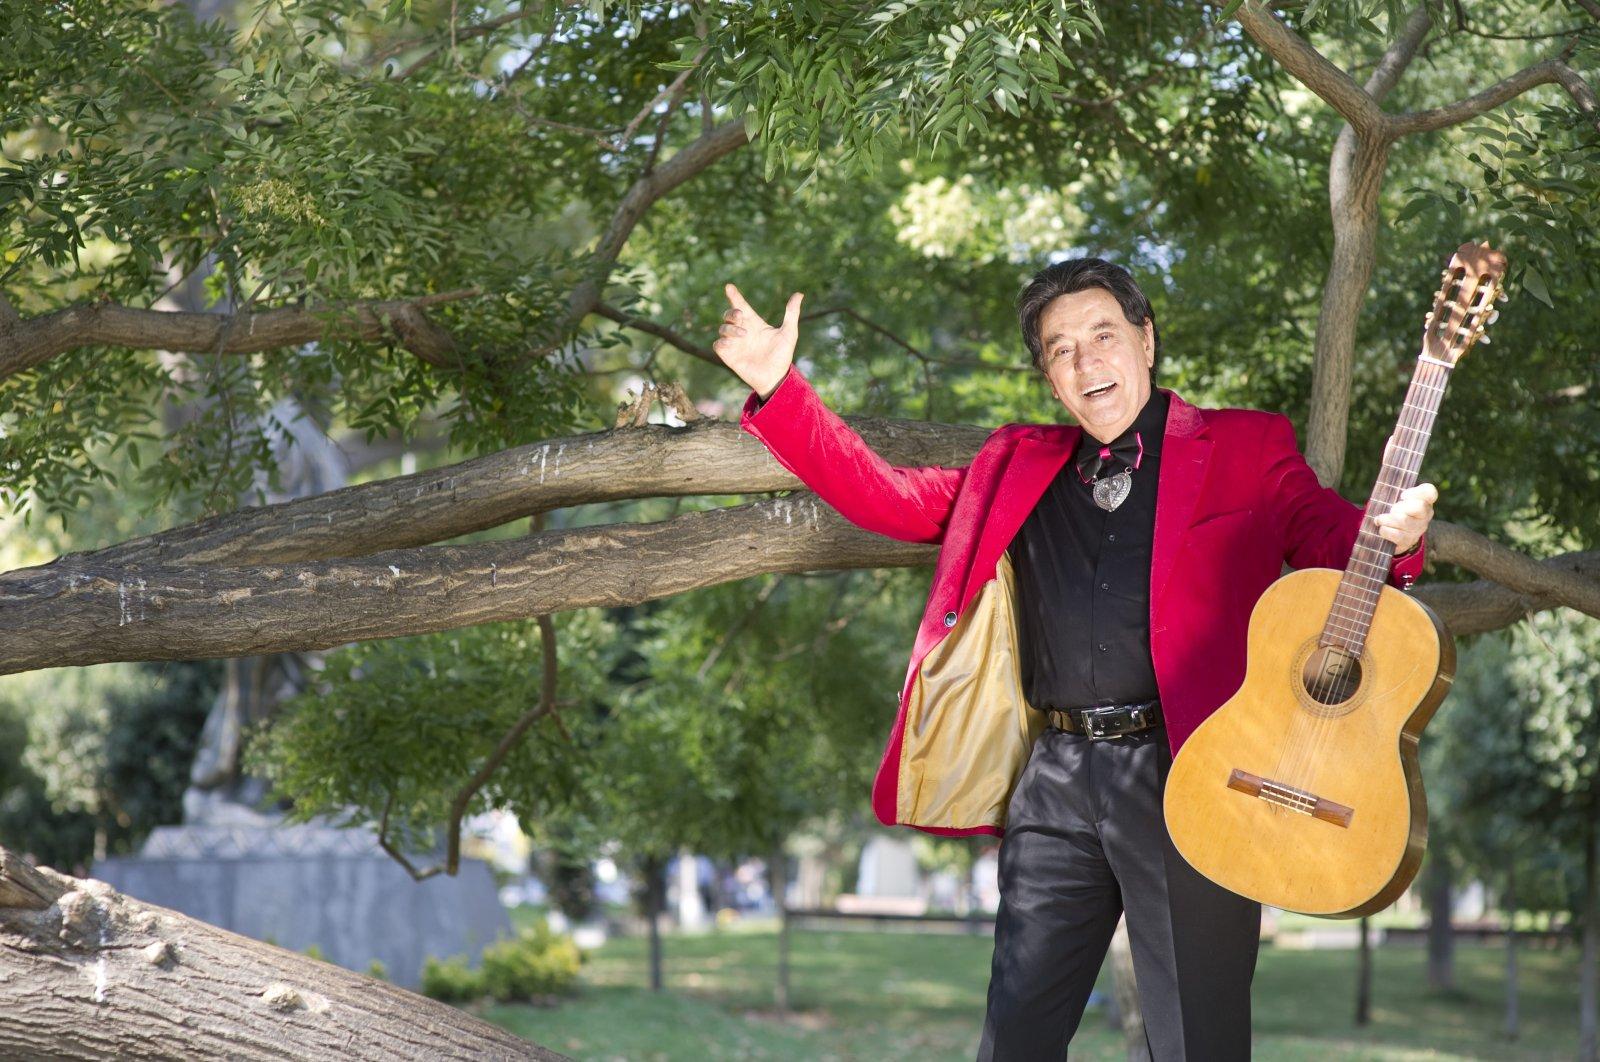 Erol Büyükburç poses with his guitar. (Archive Photo)